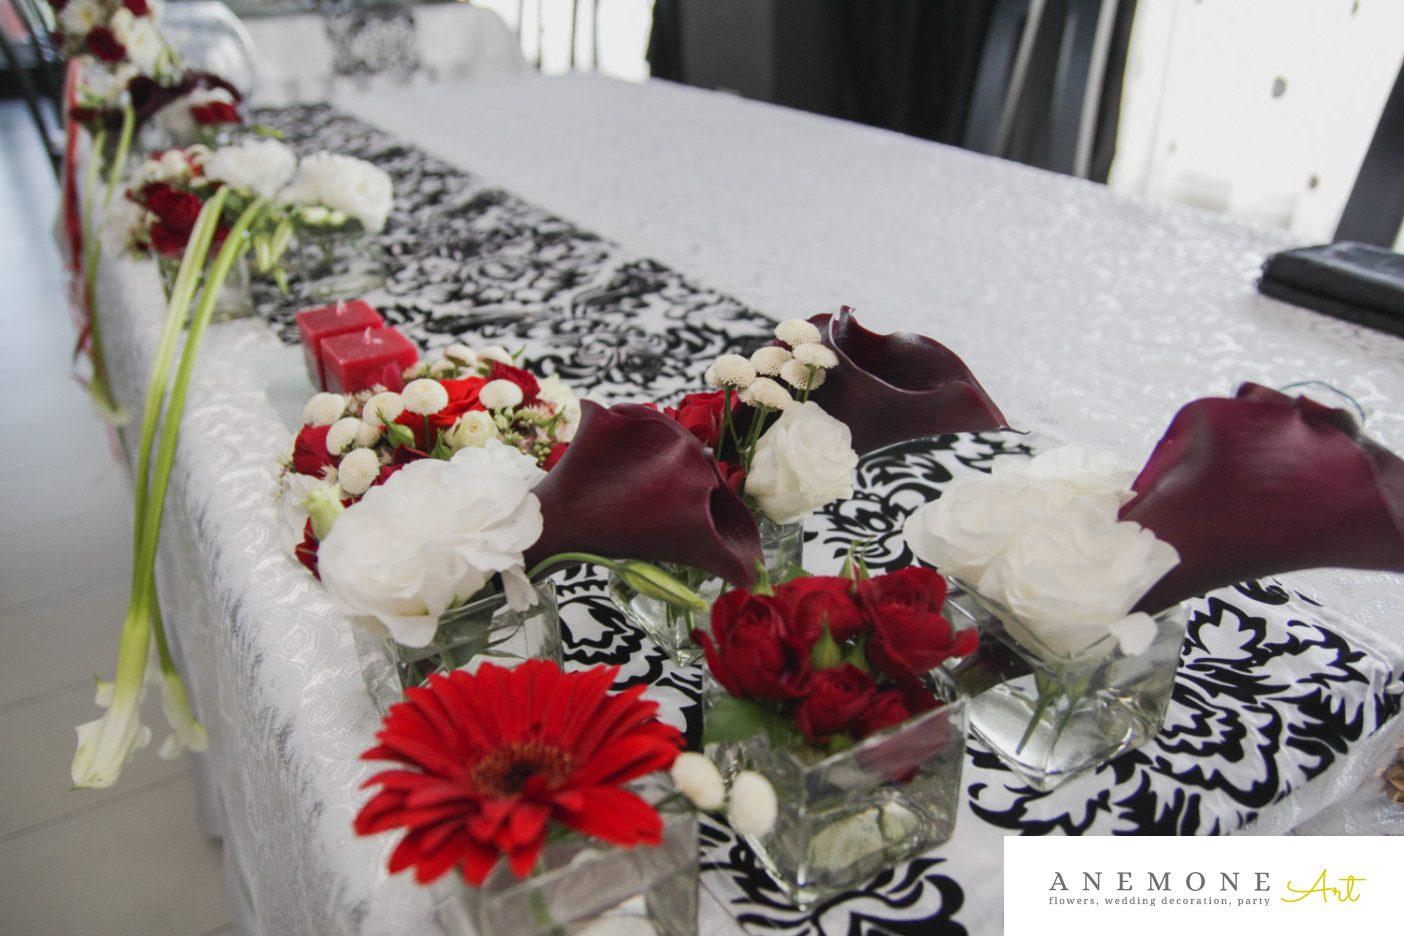 Poza, foto cu Flori de nunta calla, prezidiu, rosu, visiniu in Arad, Timisoara, Oradea (wedding flowers, bouquets) nunta Arad, Timisoara, Oradea